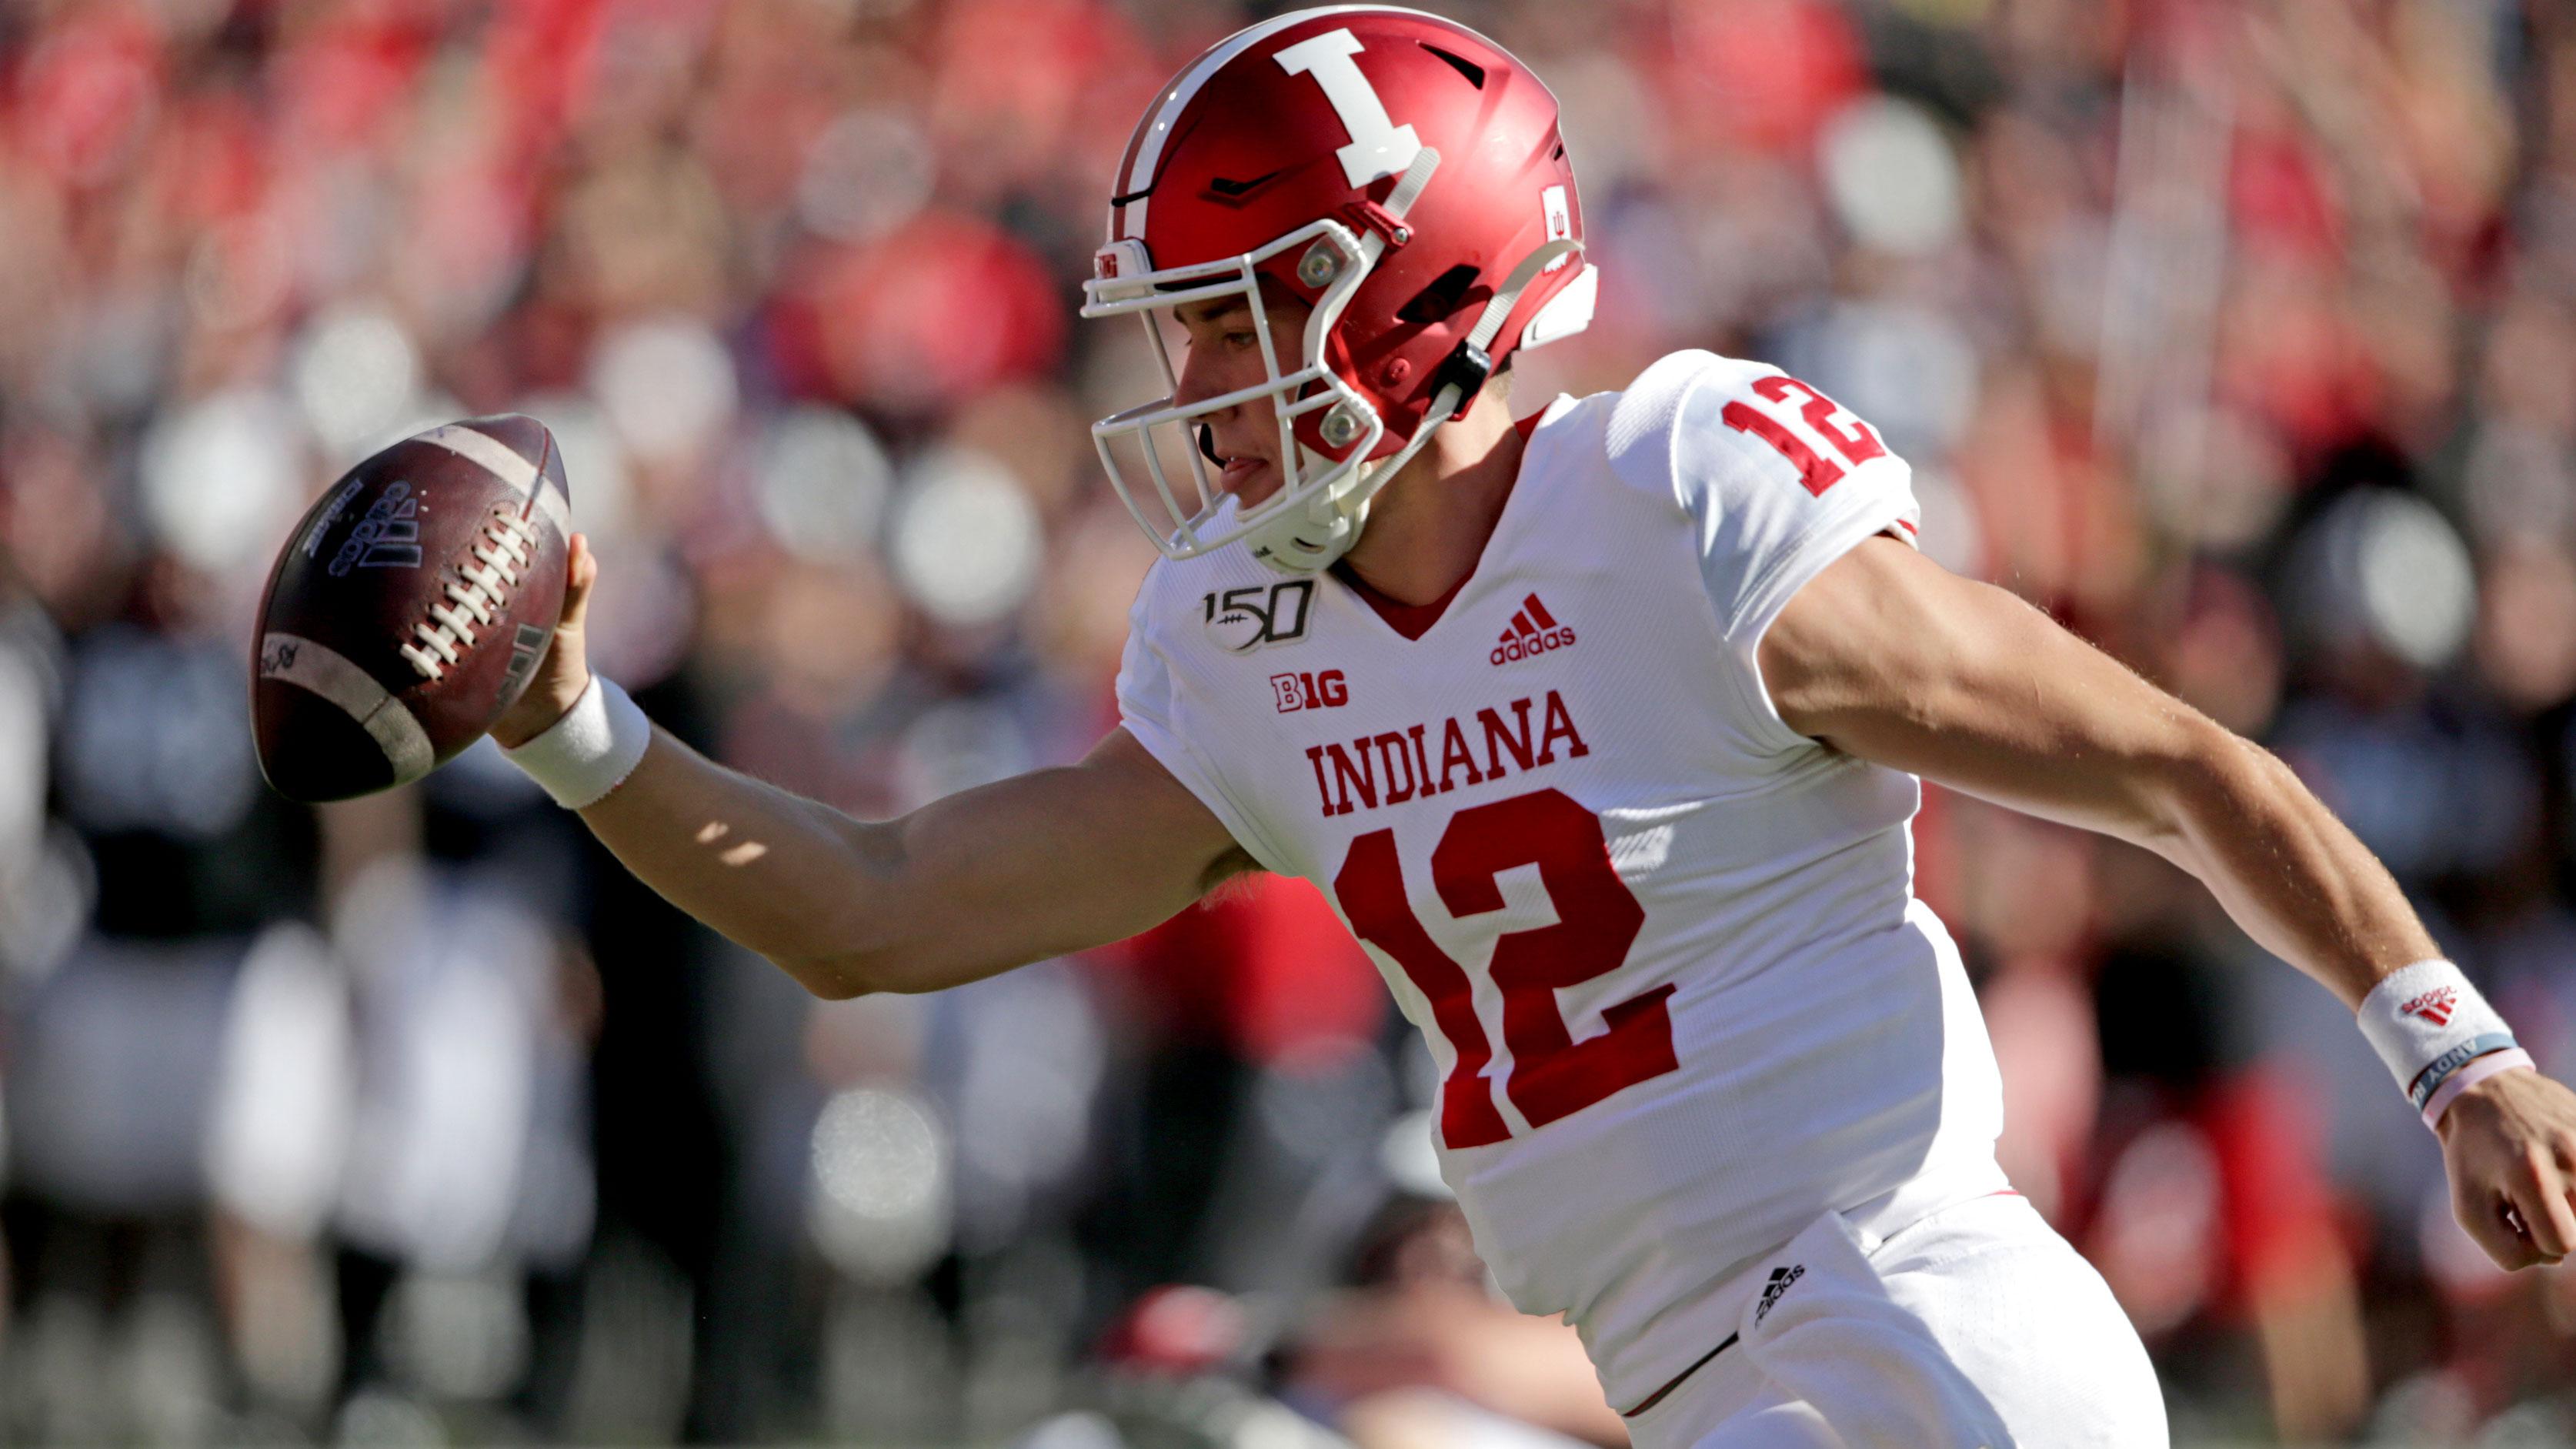 Indiana beats Nebraska 38-31 behind Ramsey's career day